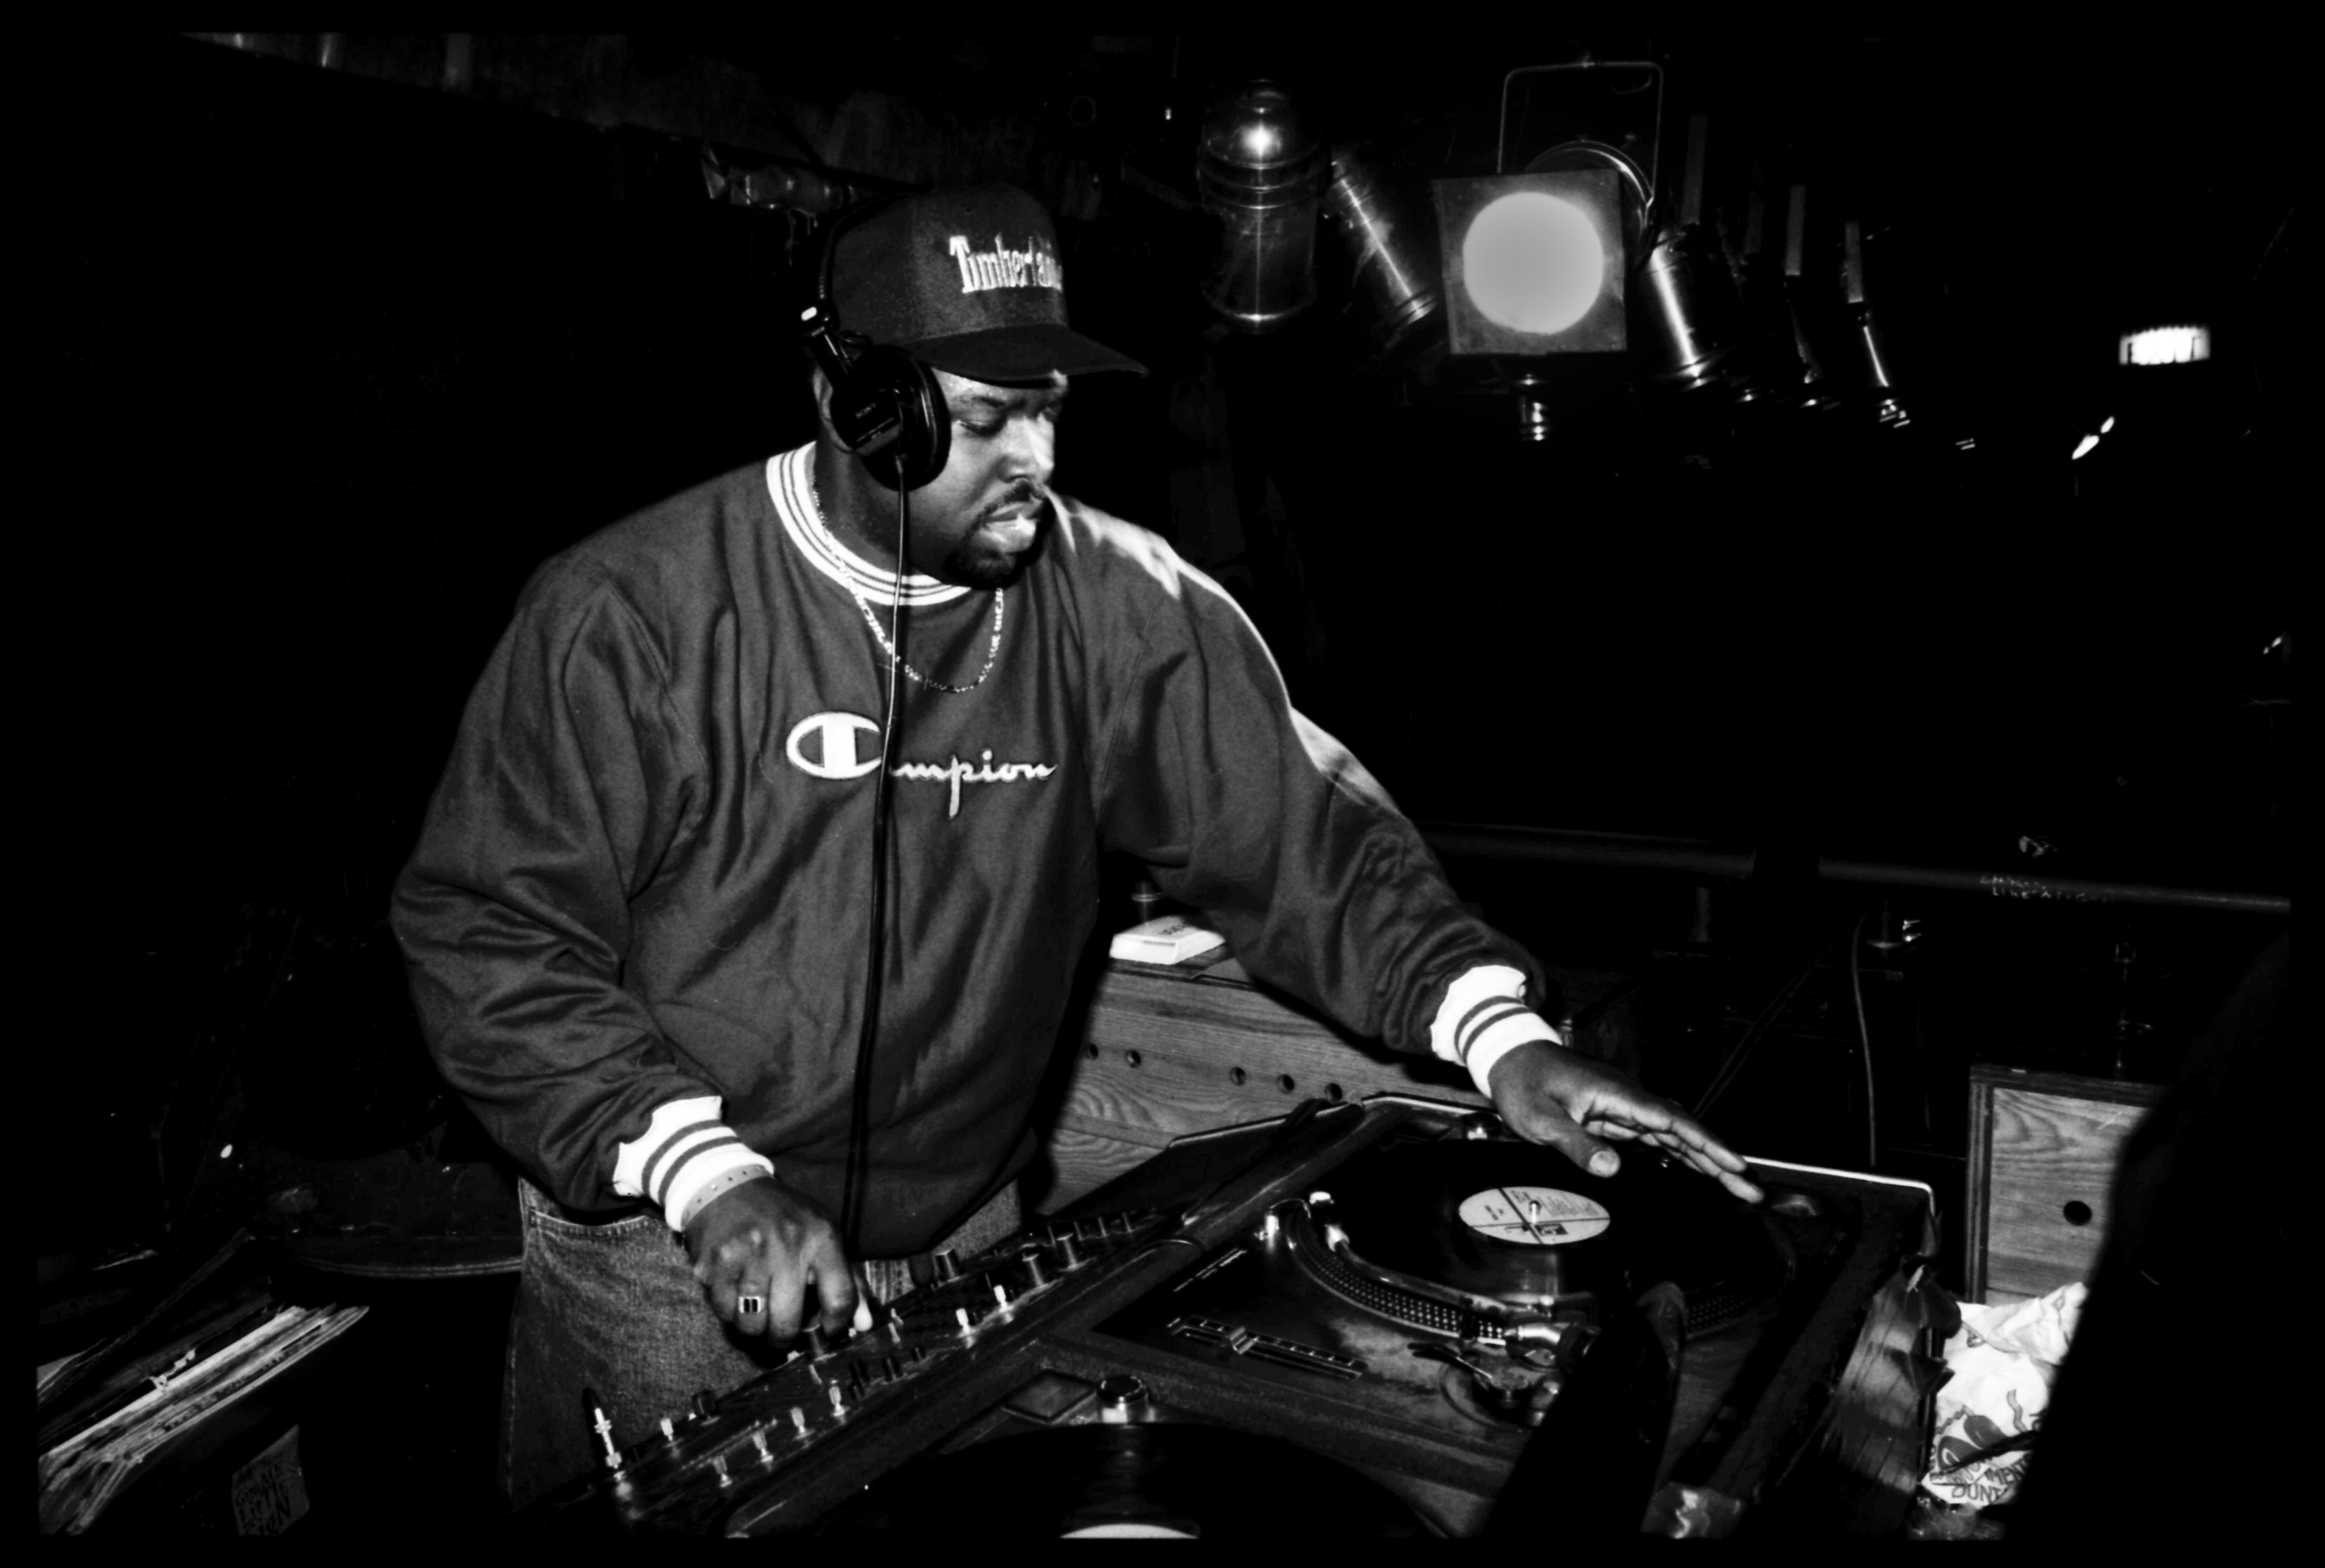 Funkmaster Flex Night: How a Letterman Diss Became Hip-Hop Legend